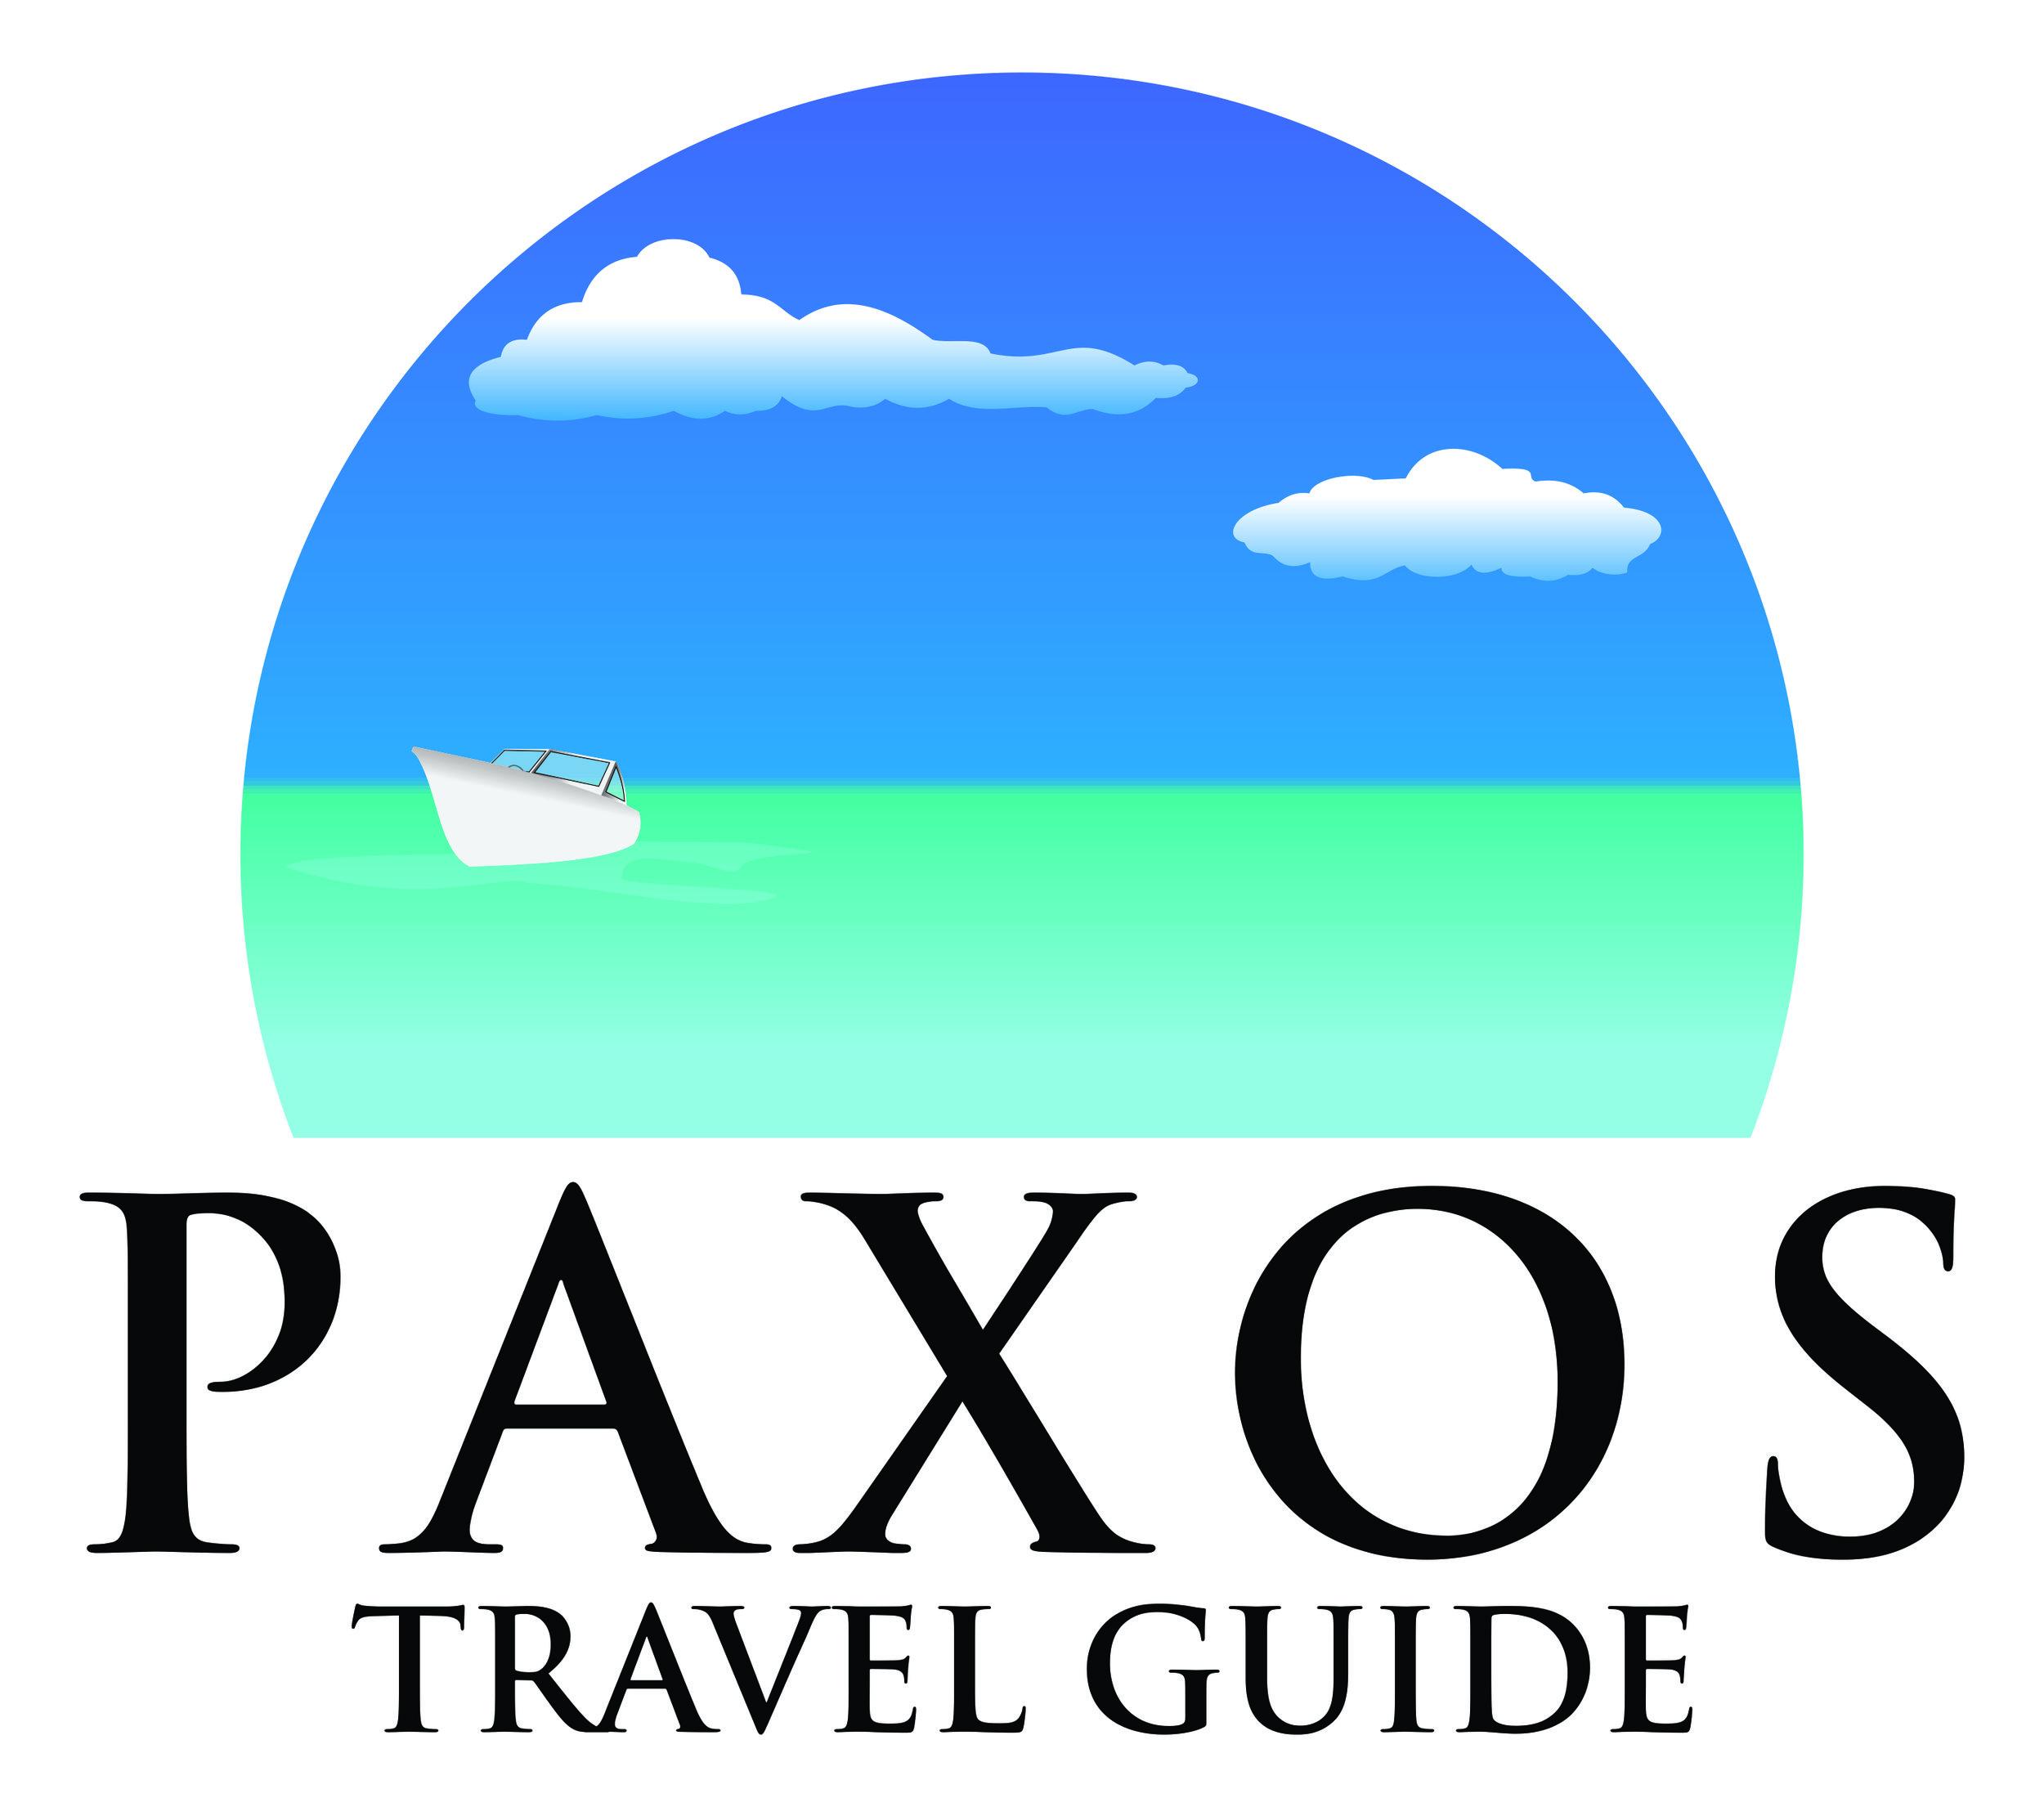 Paxos Travel Guide by Rick McEvoy